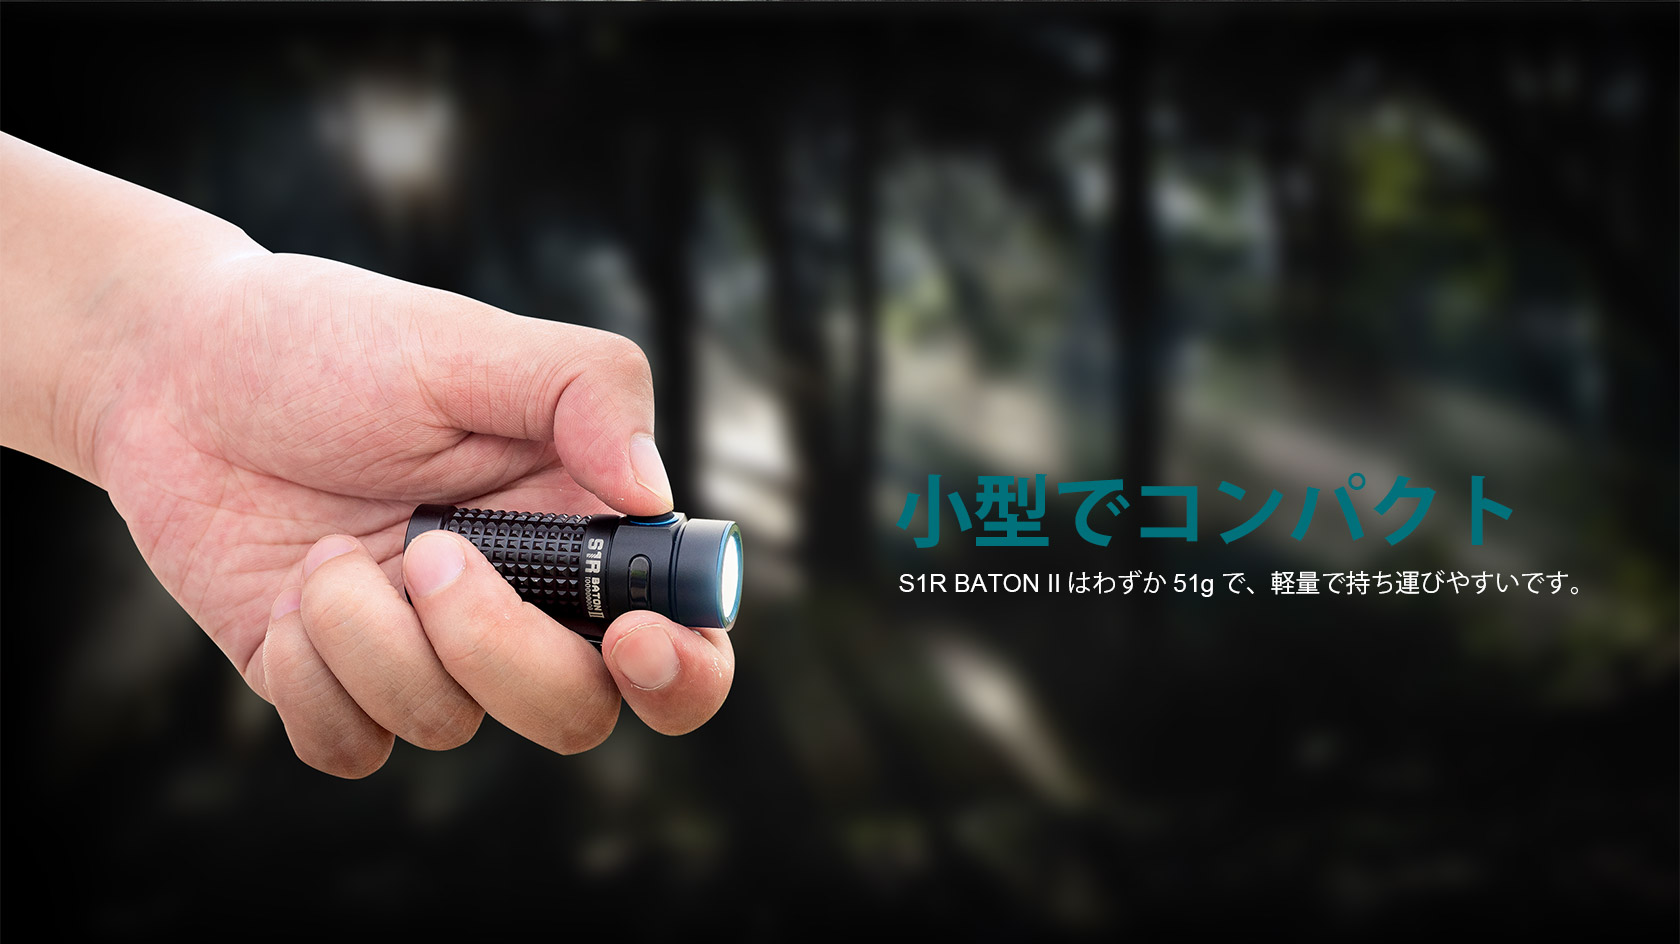 S1R BATON IIは小型で、持ち運びが可能です